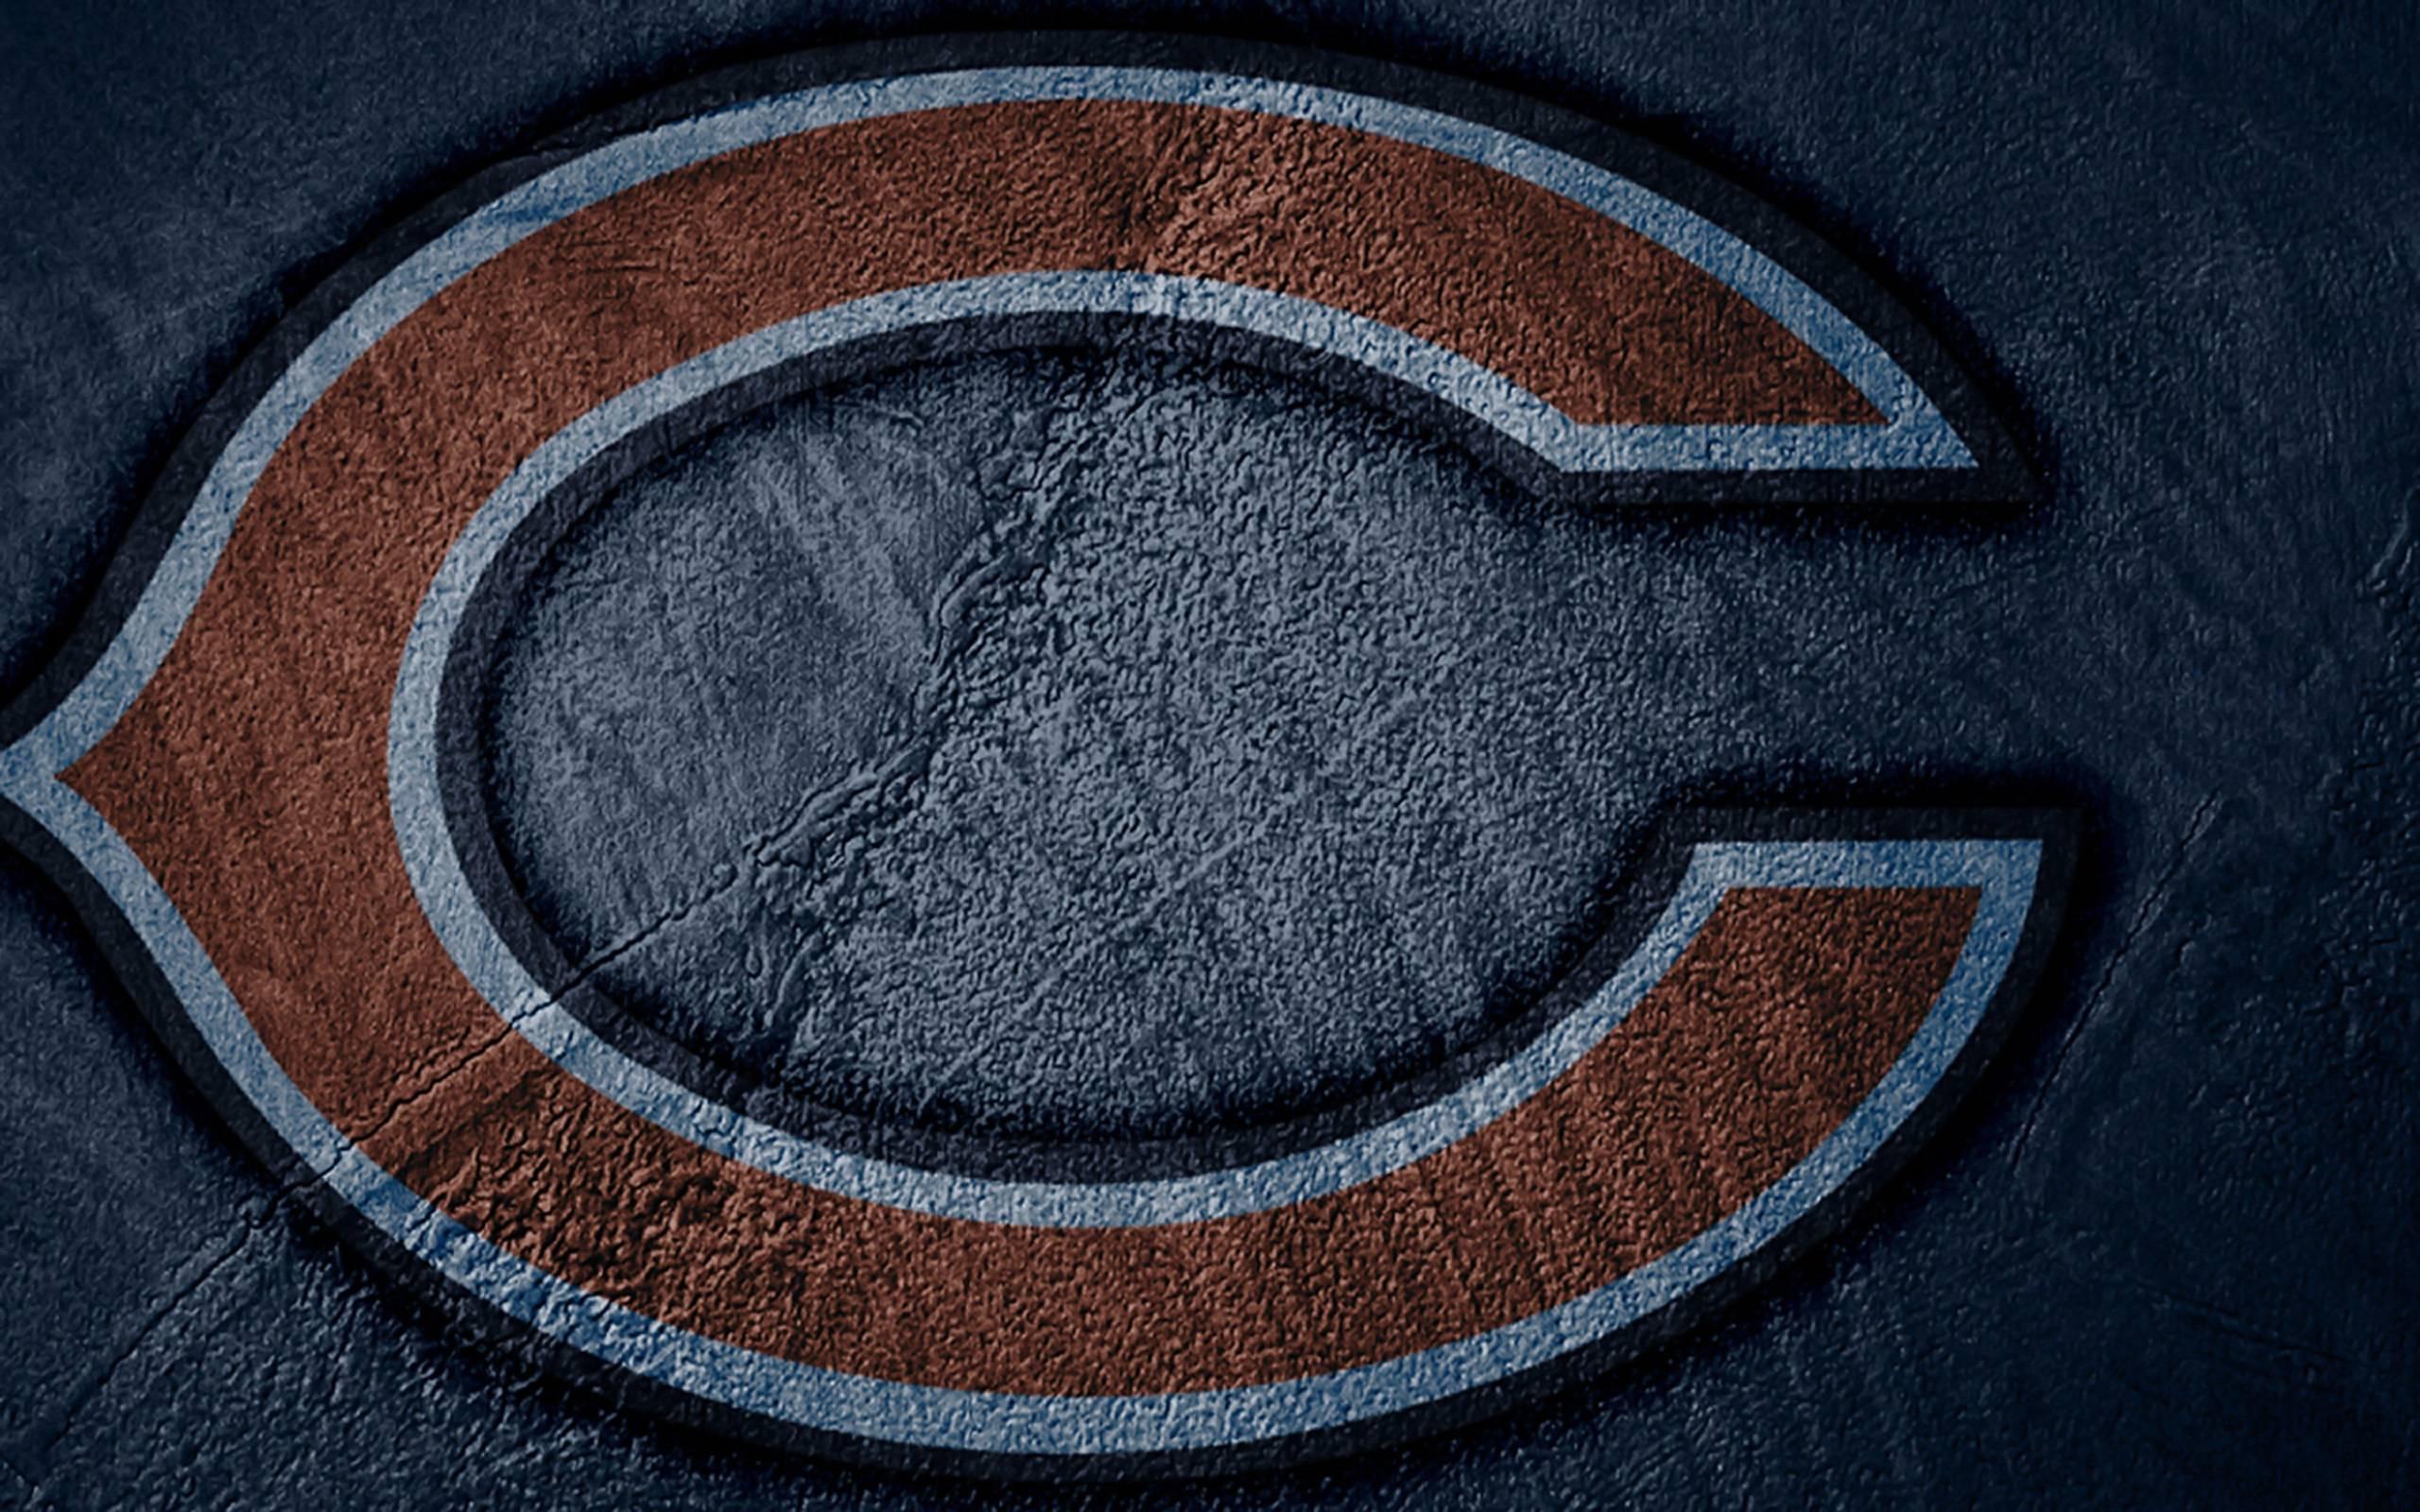 Chicago Bears Soldier Field : Desktop And Mobile Wallpaper taken .